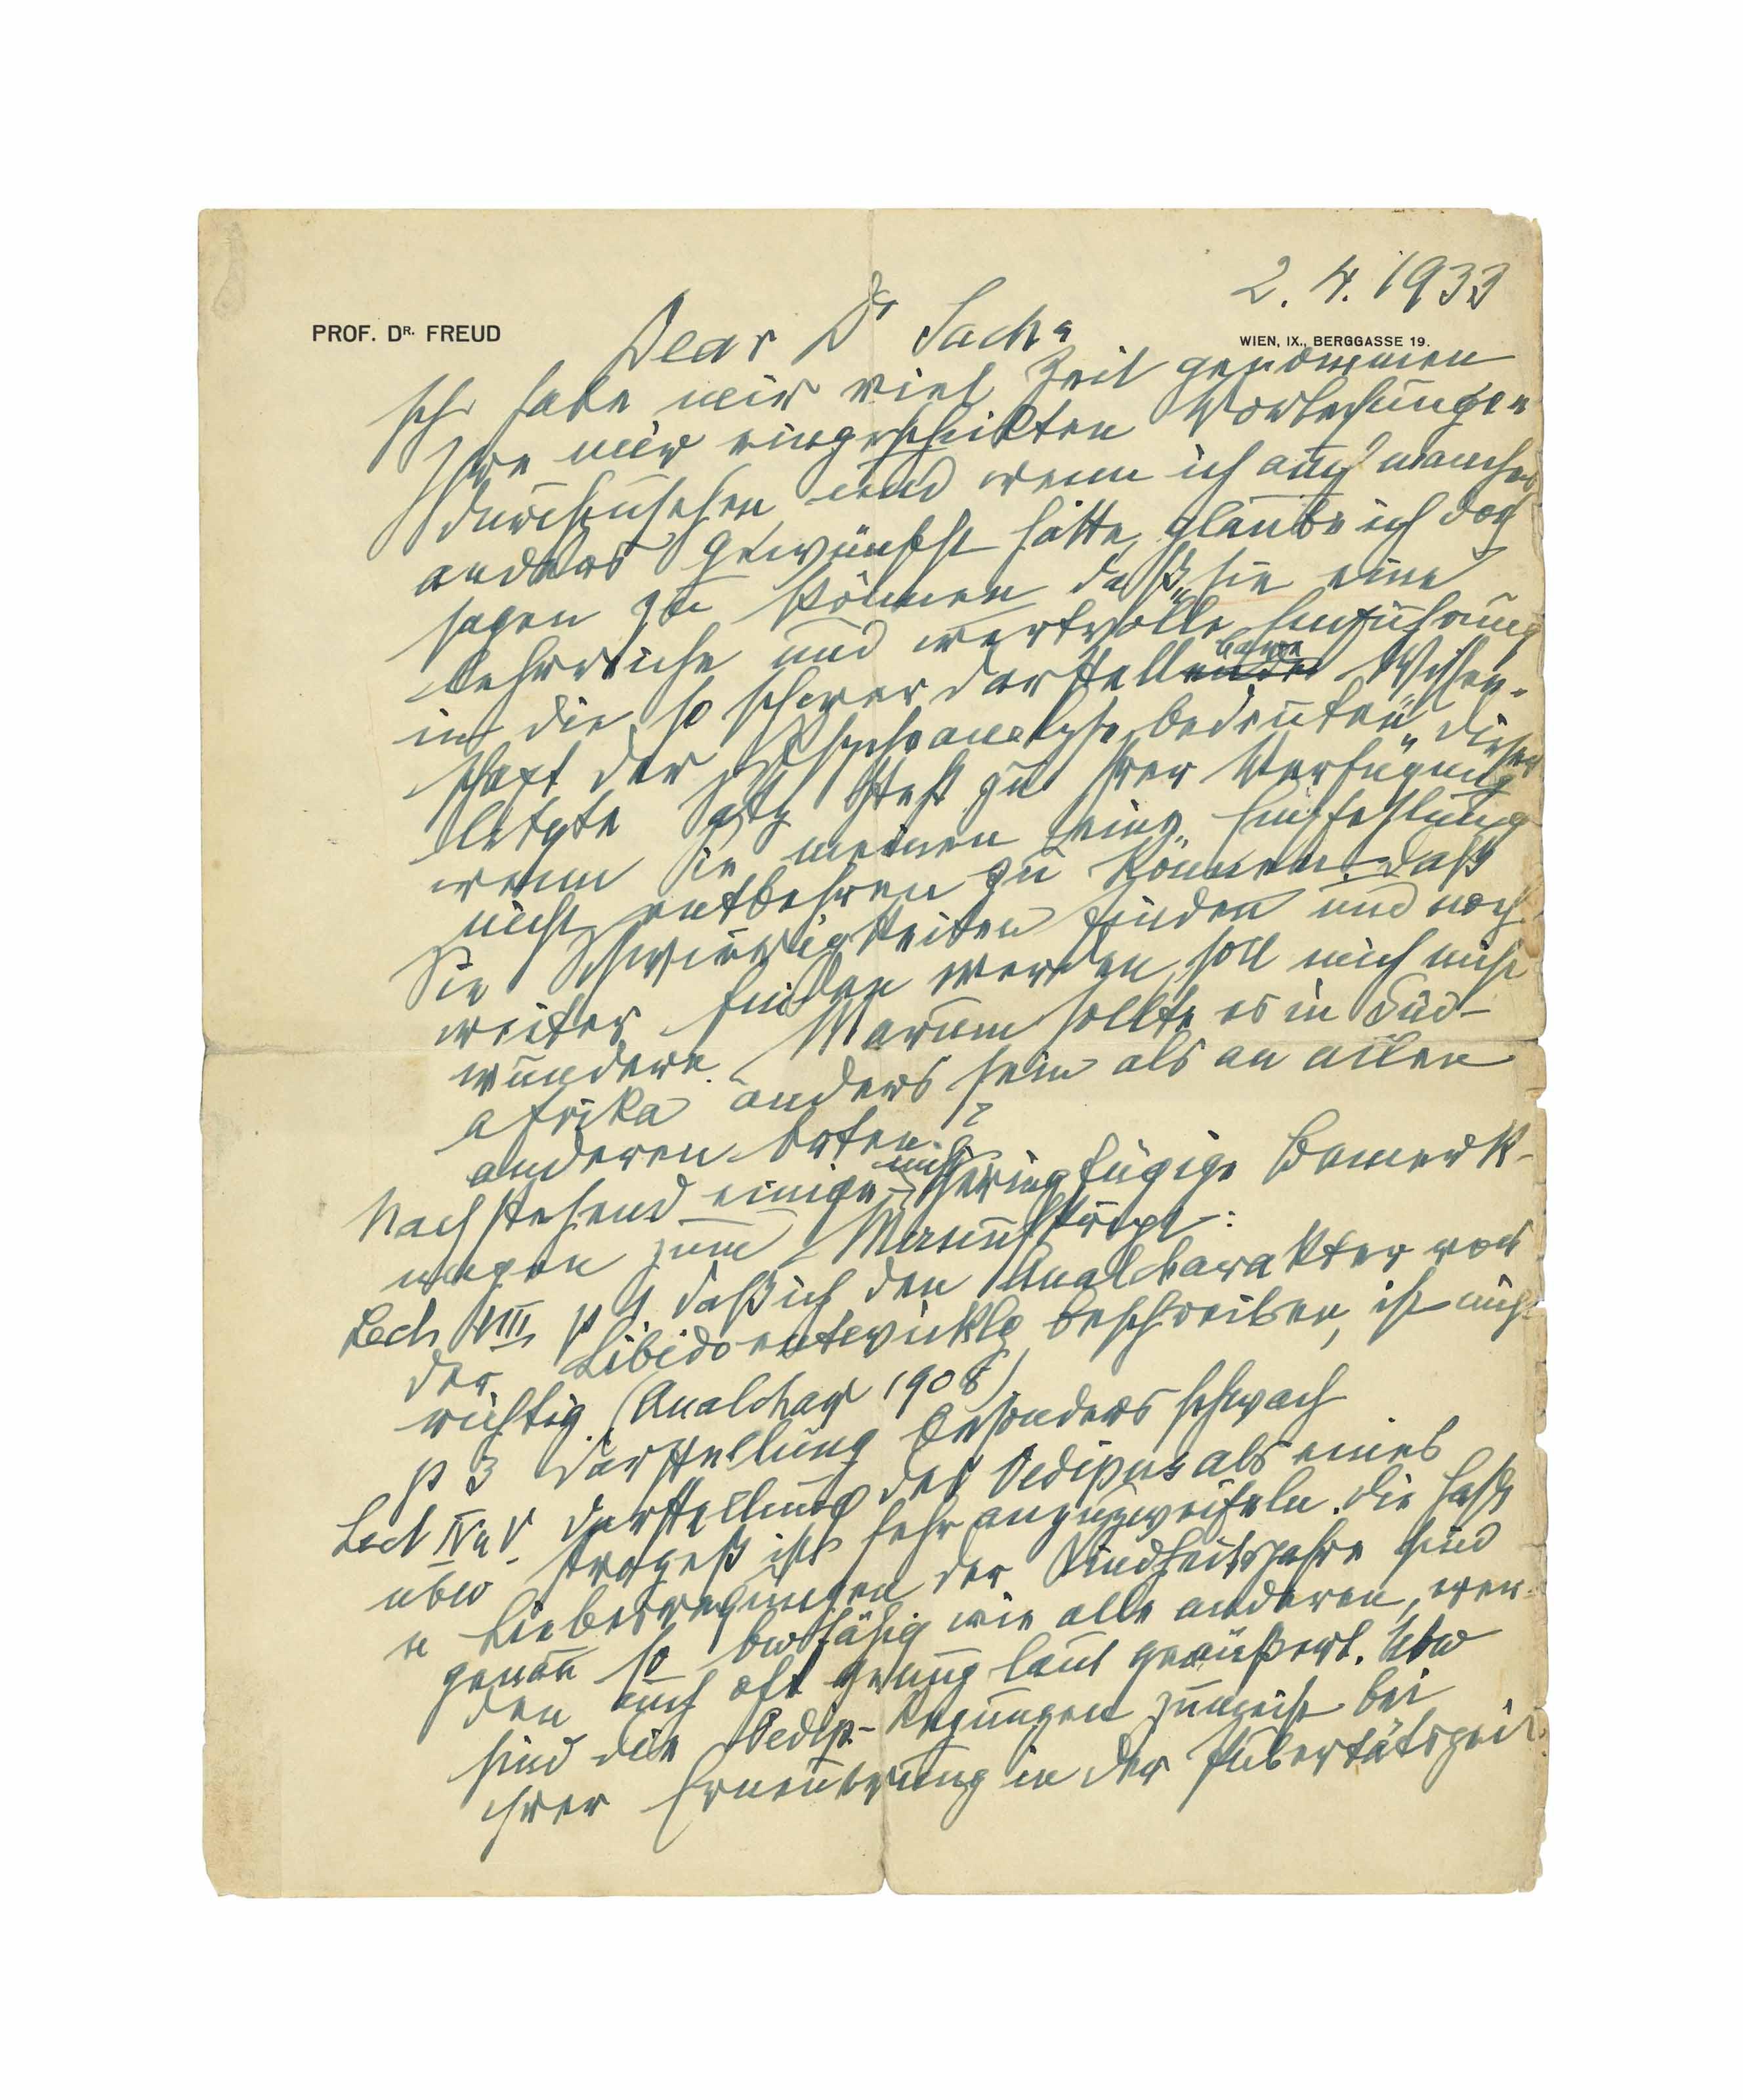 FREUD, Sigmund. Autograph letter signed ('Freud') to Dr [Wulf] Sachs, Berggasse 19, Vienna, 2 April 1933.